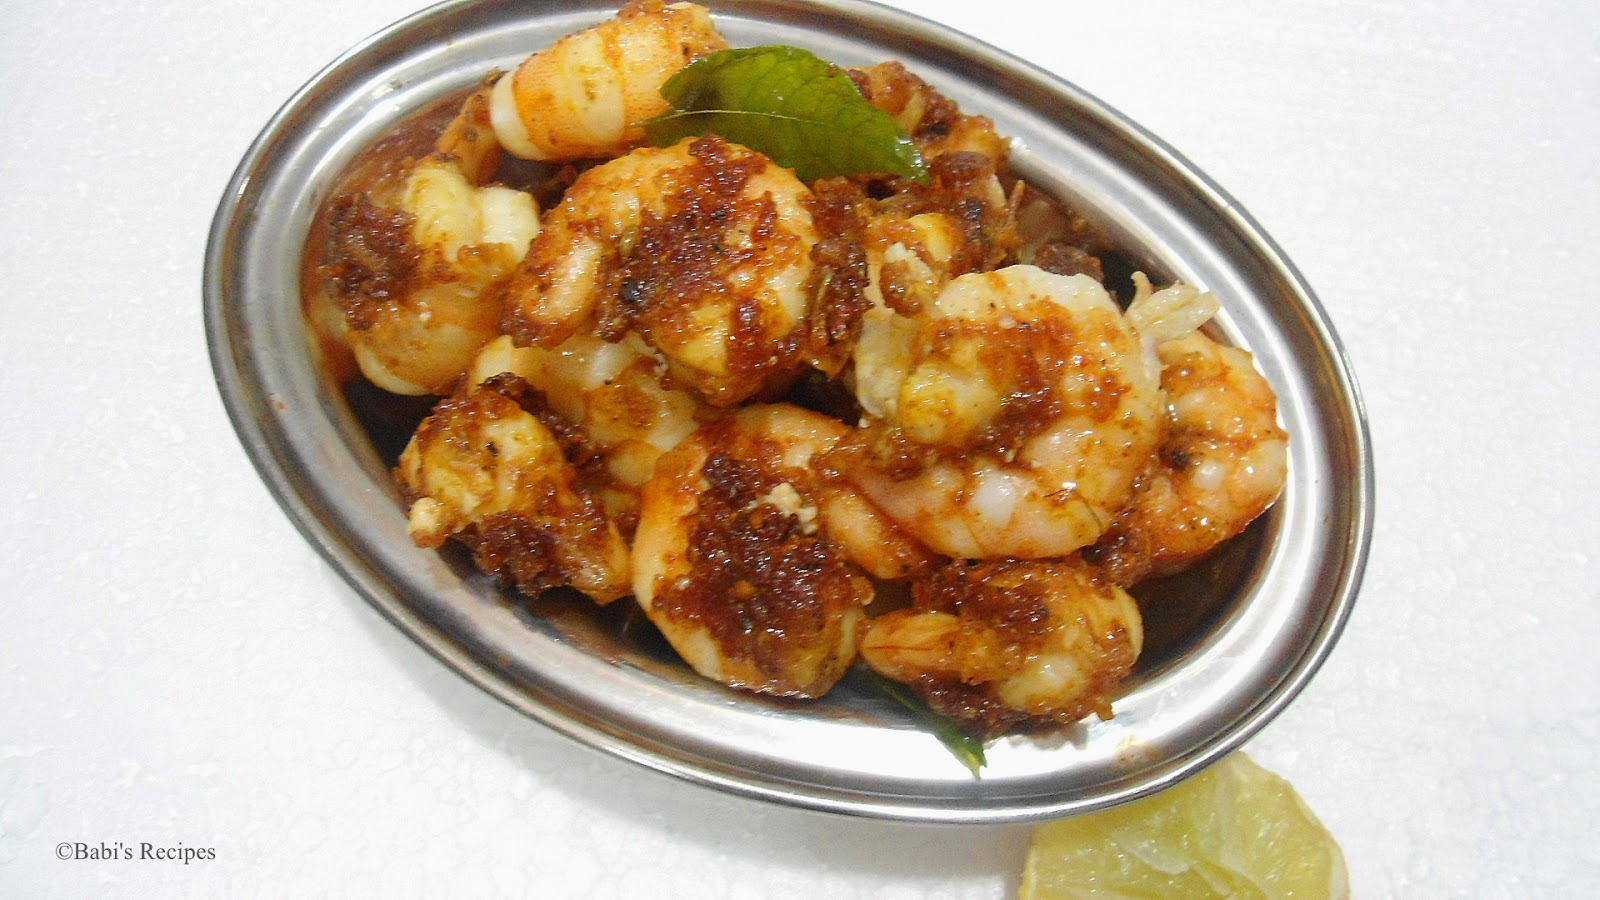 Babi S Recipes South Indian Easy Cooking Ideas Prawn Fry Prawn